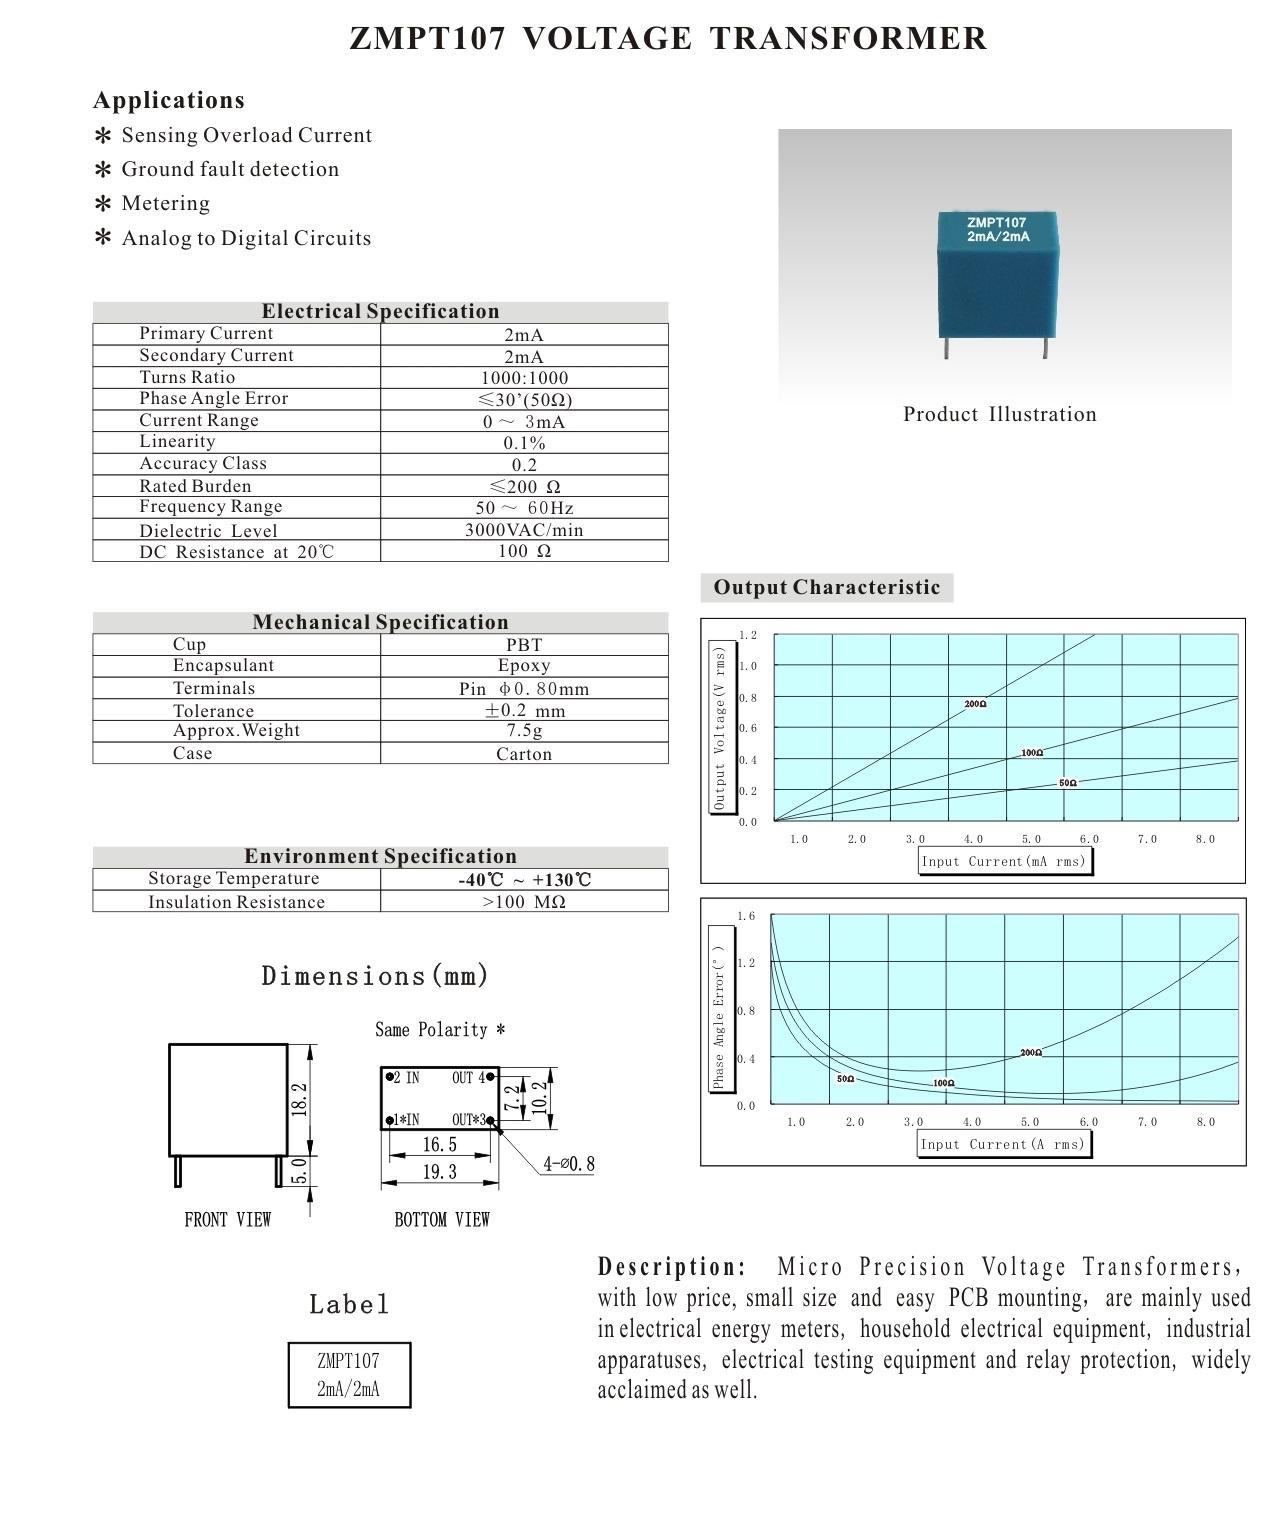 ZMPT107 Datasheet